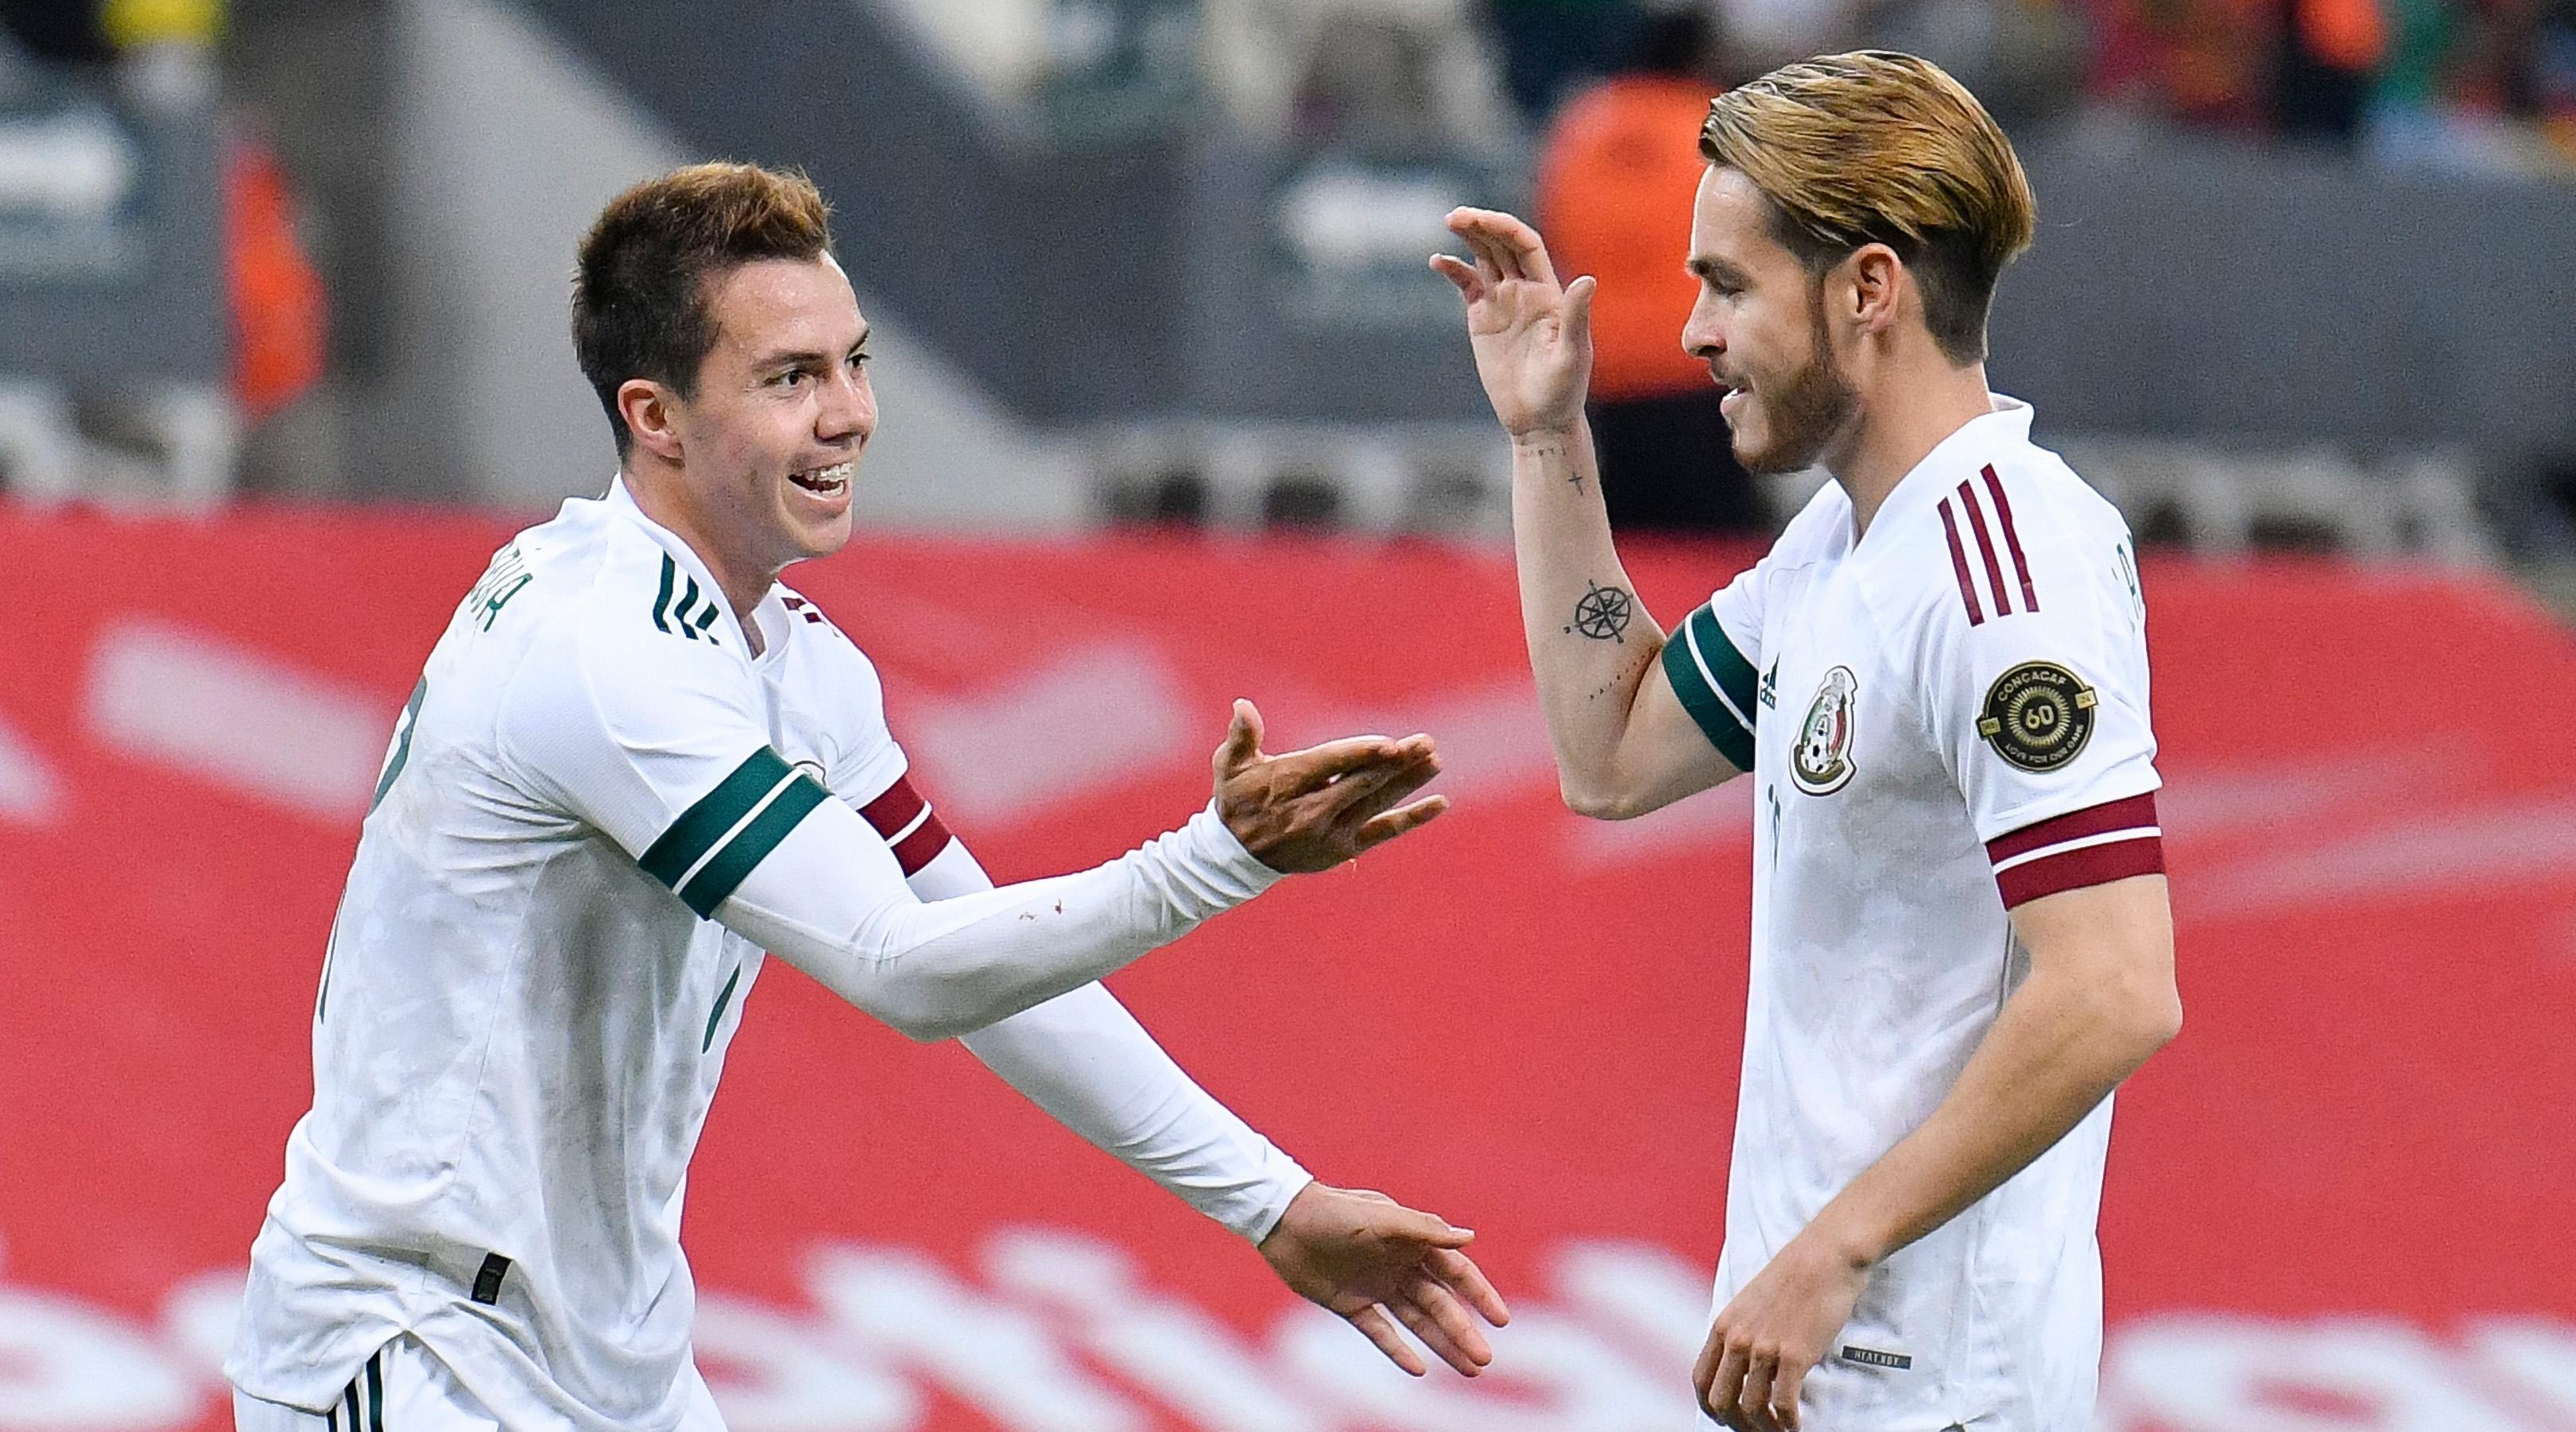 México goleó a República Dominicana con hat trick de Sebastián Córdova | VIDEOS VER GOLES | Preolímpico CONCACAF | Bolavip